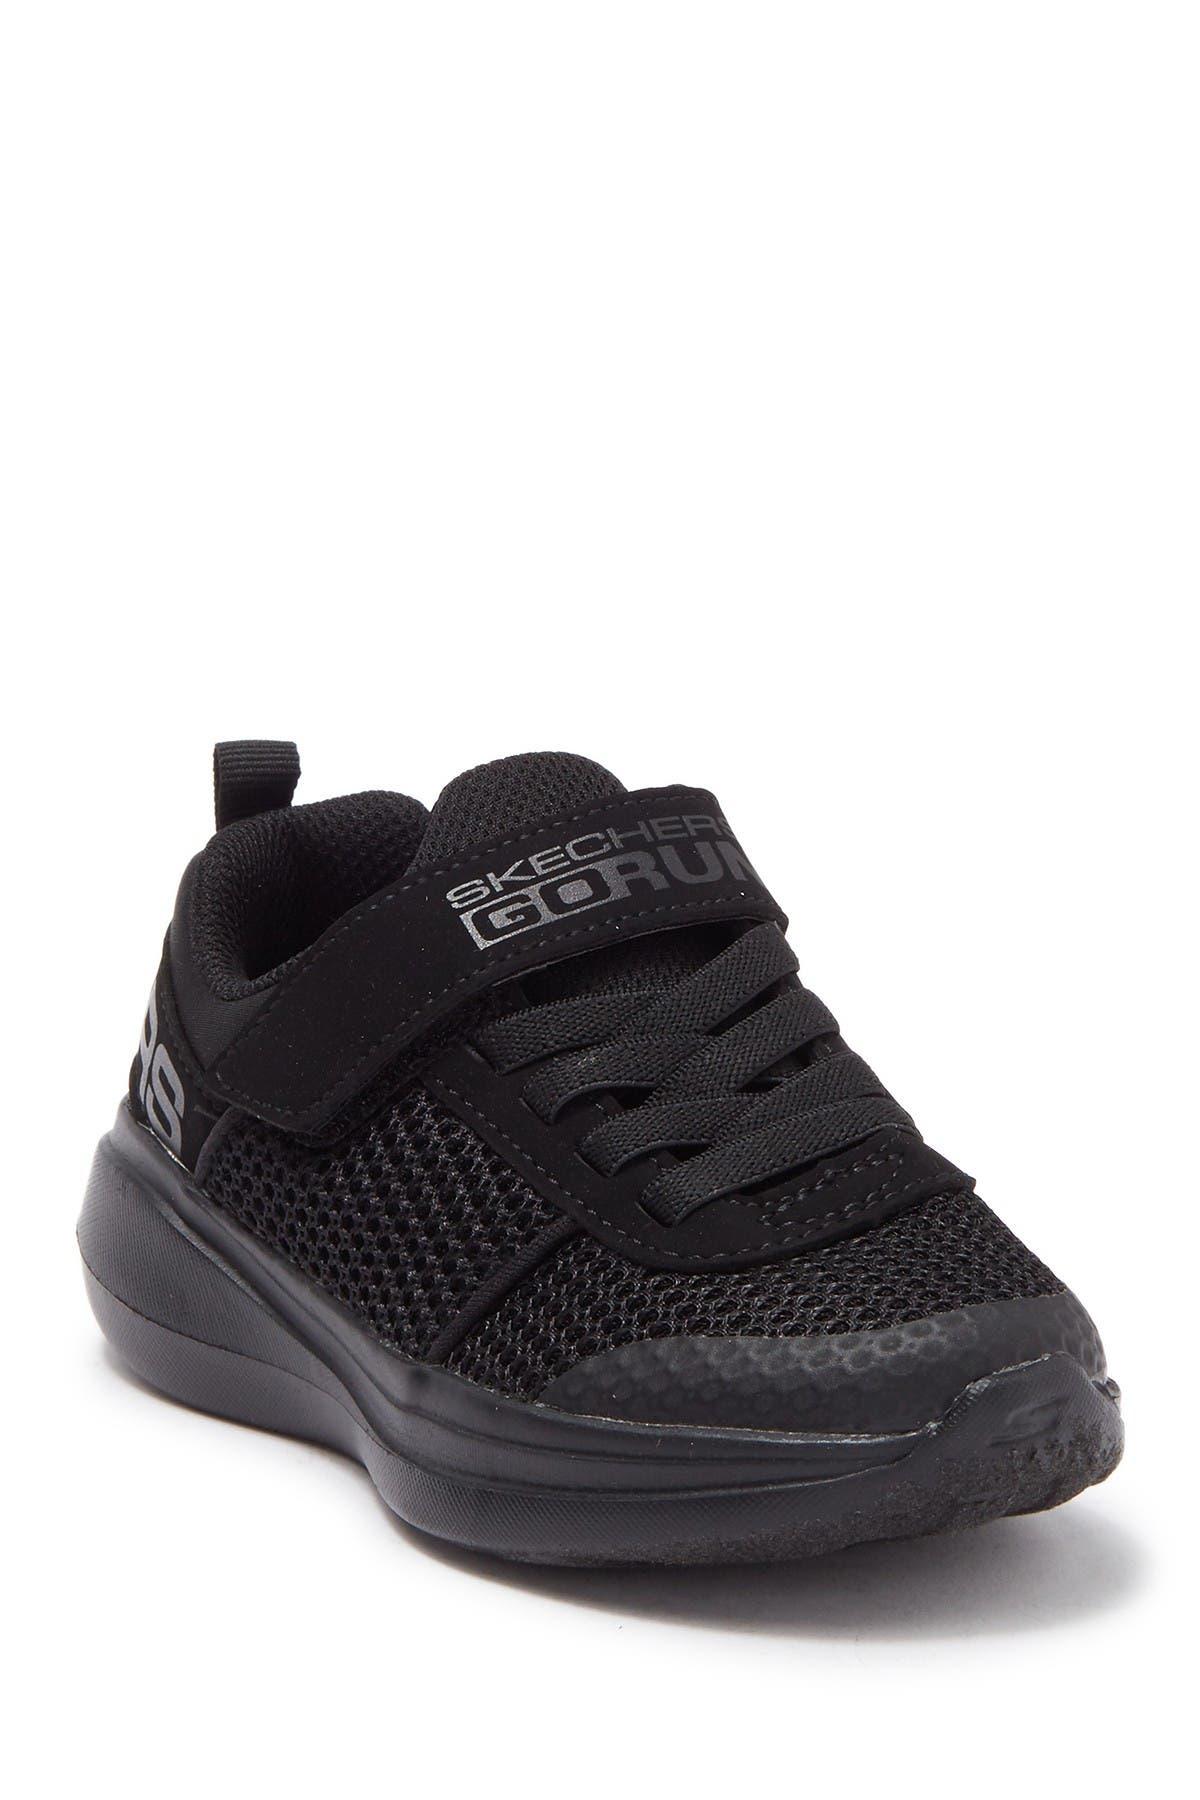 Image of Skechers Go Run Fast Denzo Sneaker